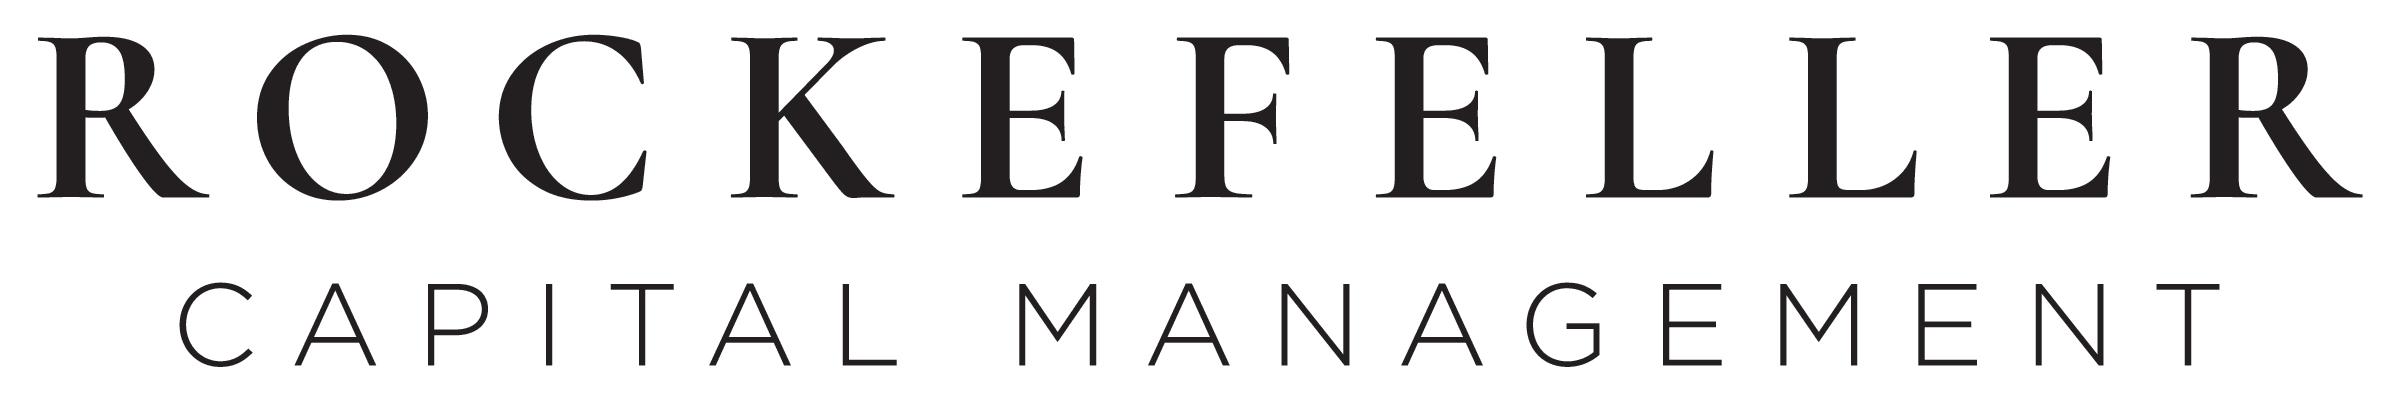 Rockefeller Capital Management